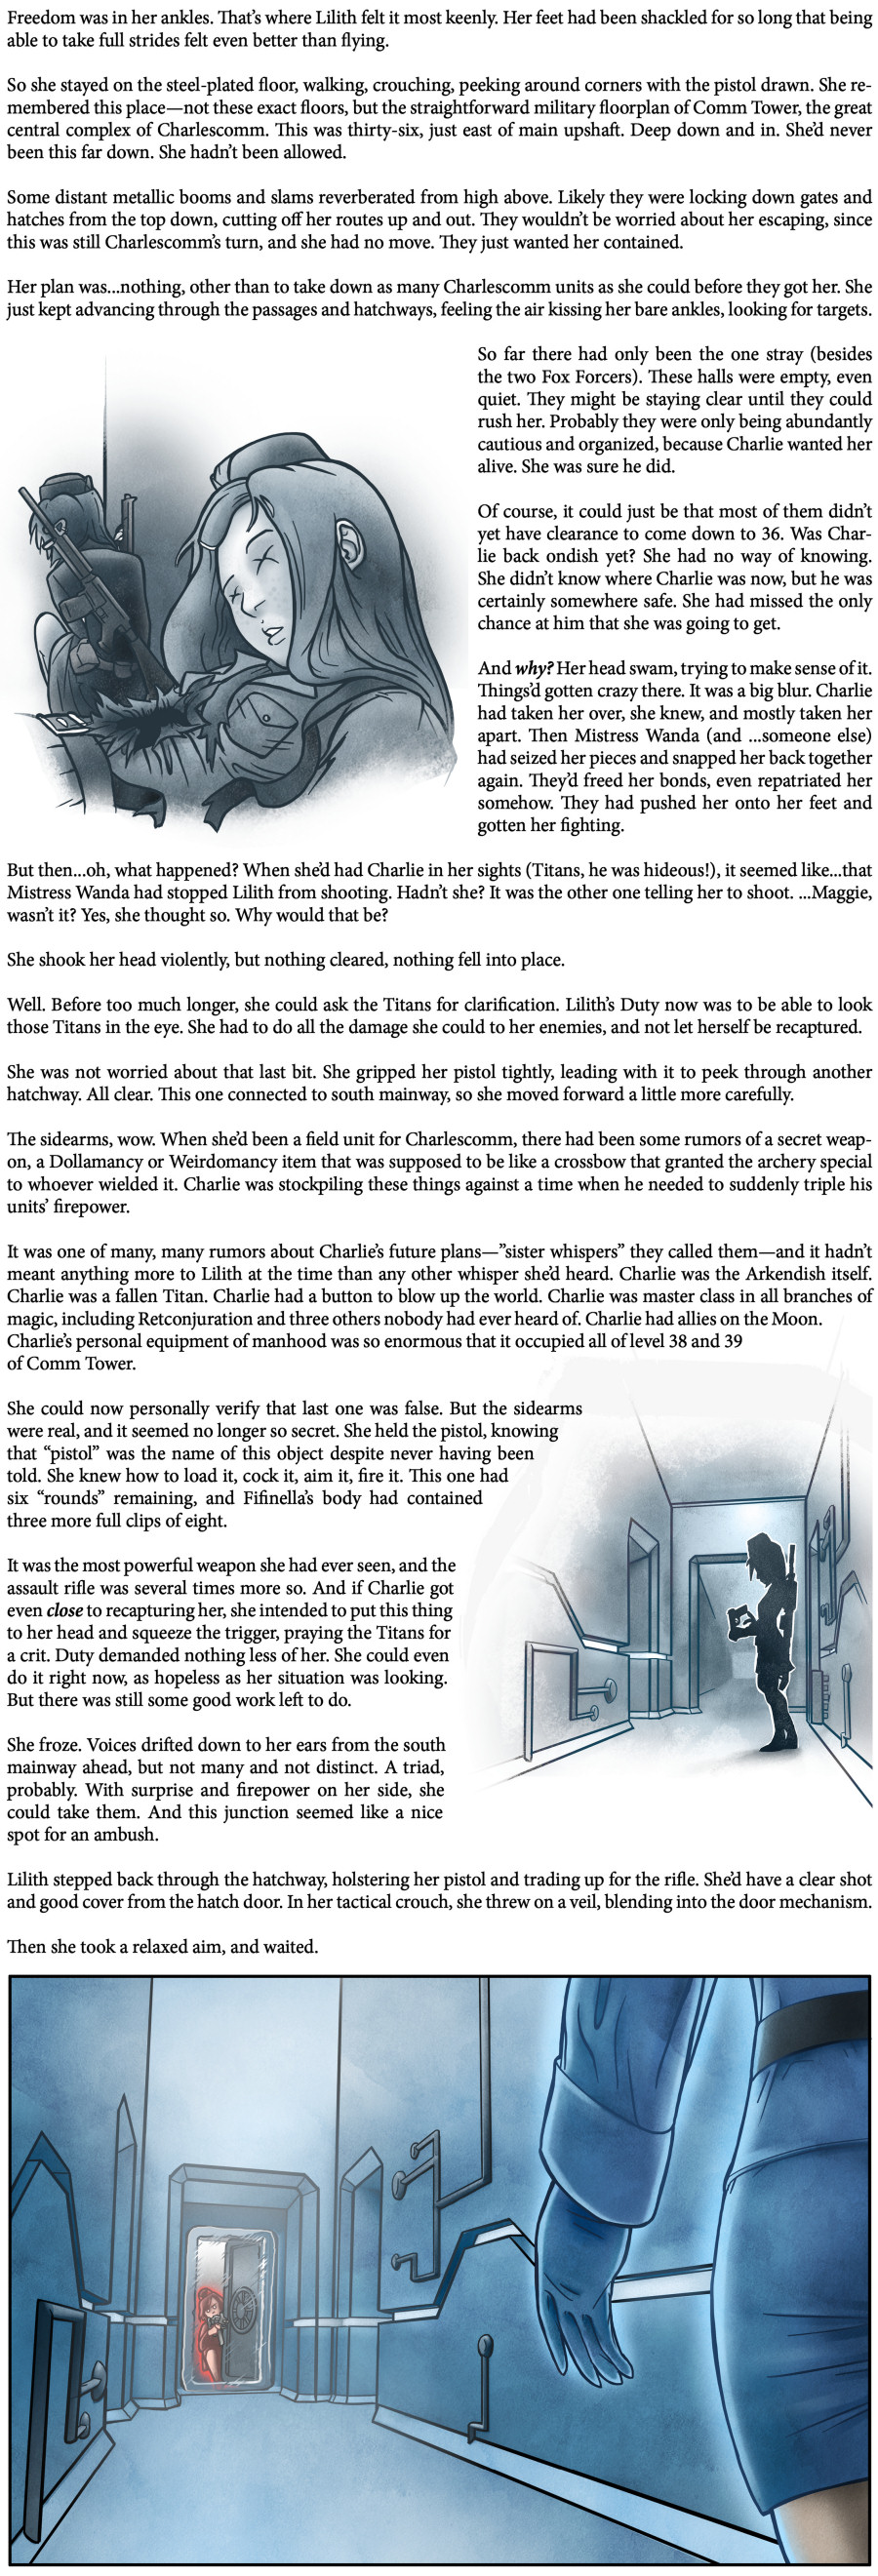 Comic - Book 3 - Page 99